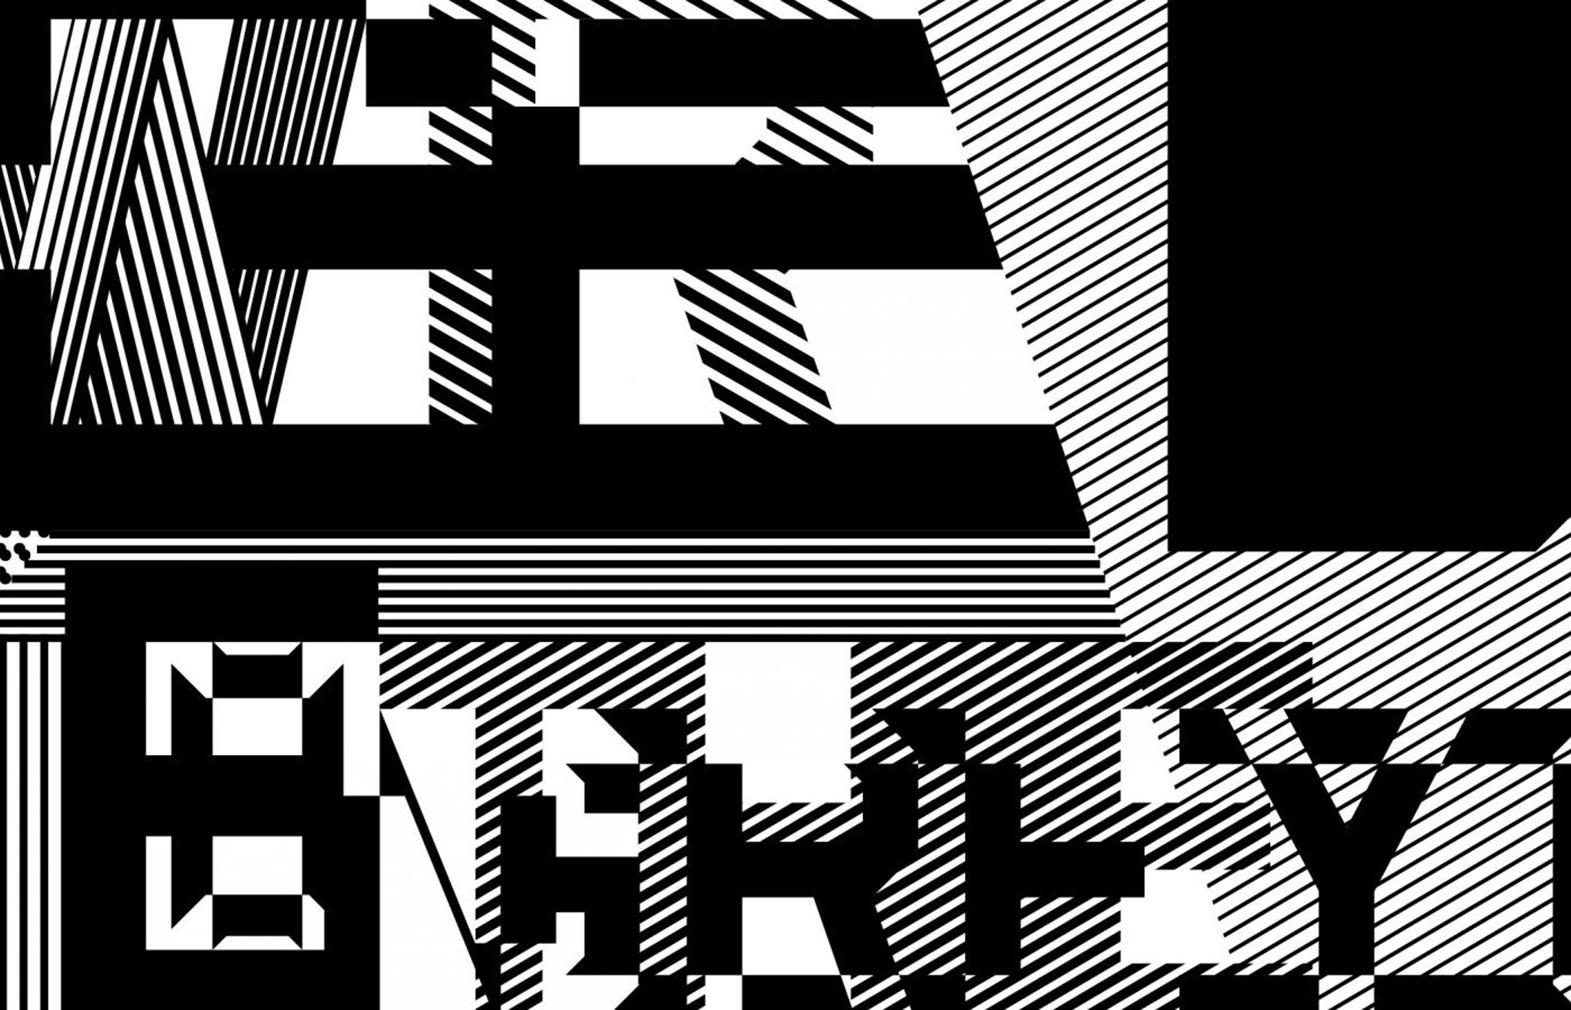 London Design Festival 2018 installation by Pentagram